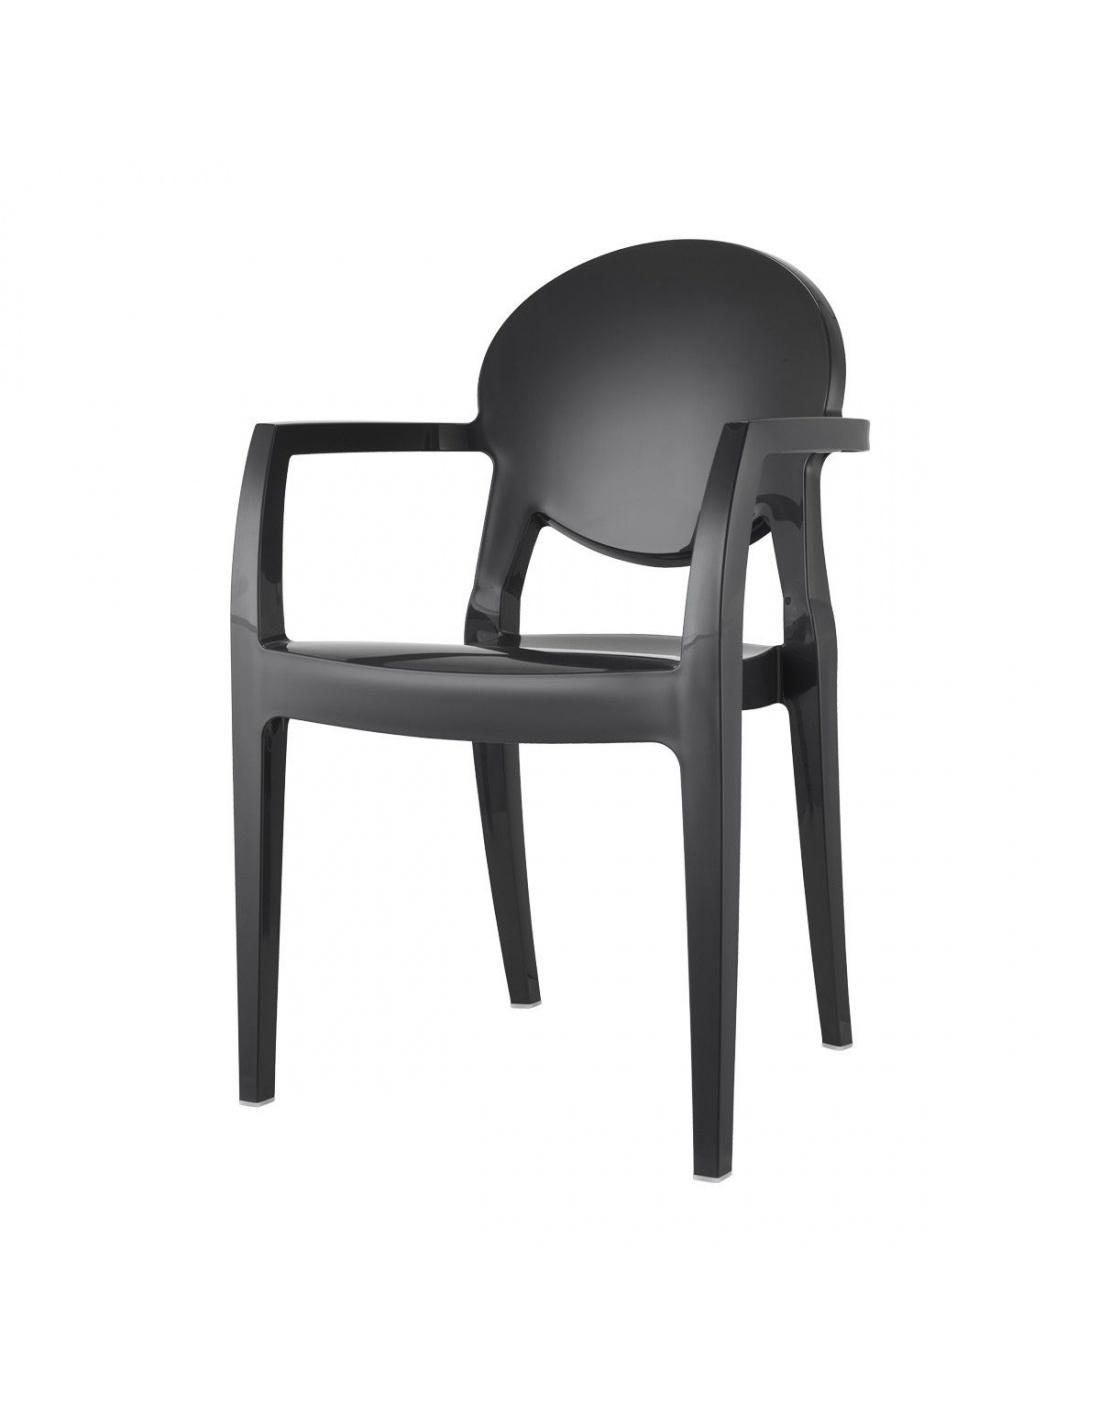 igloo tecnopolimero sedia scab design minimo 4 pezzi